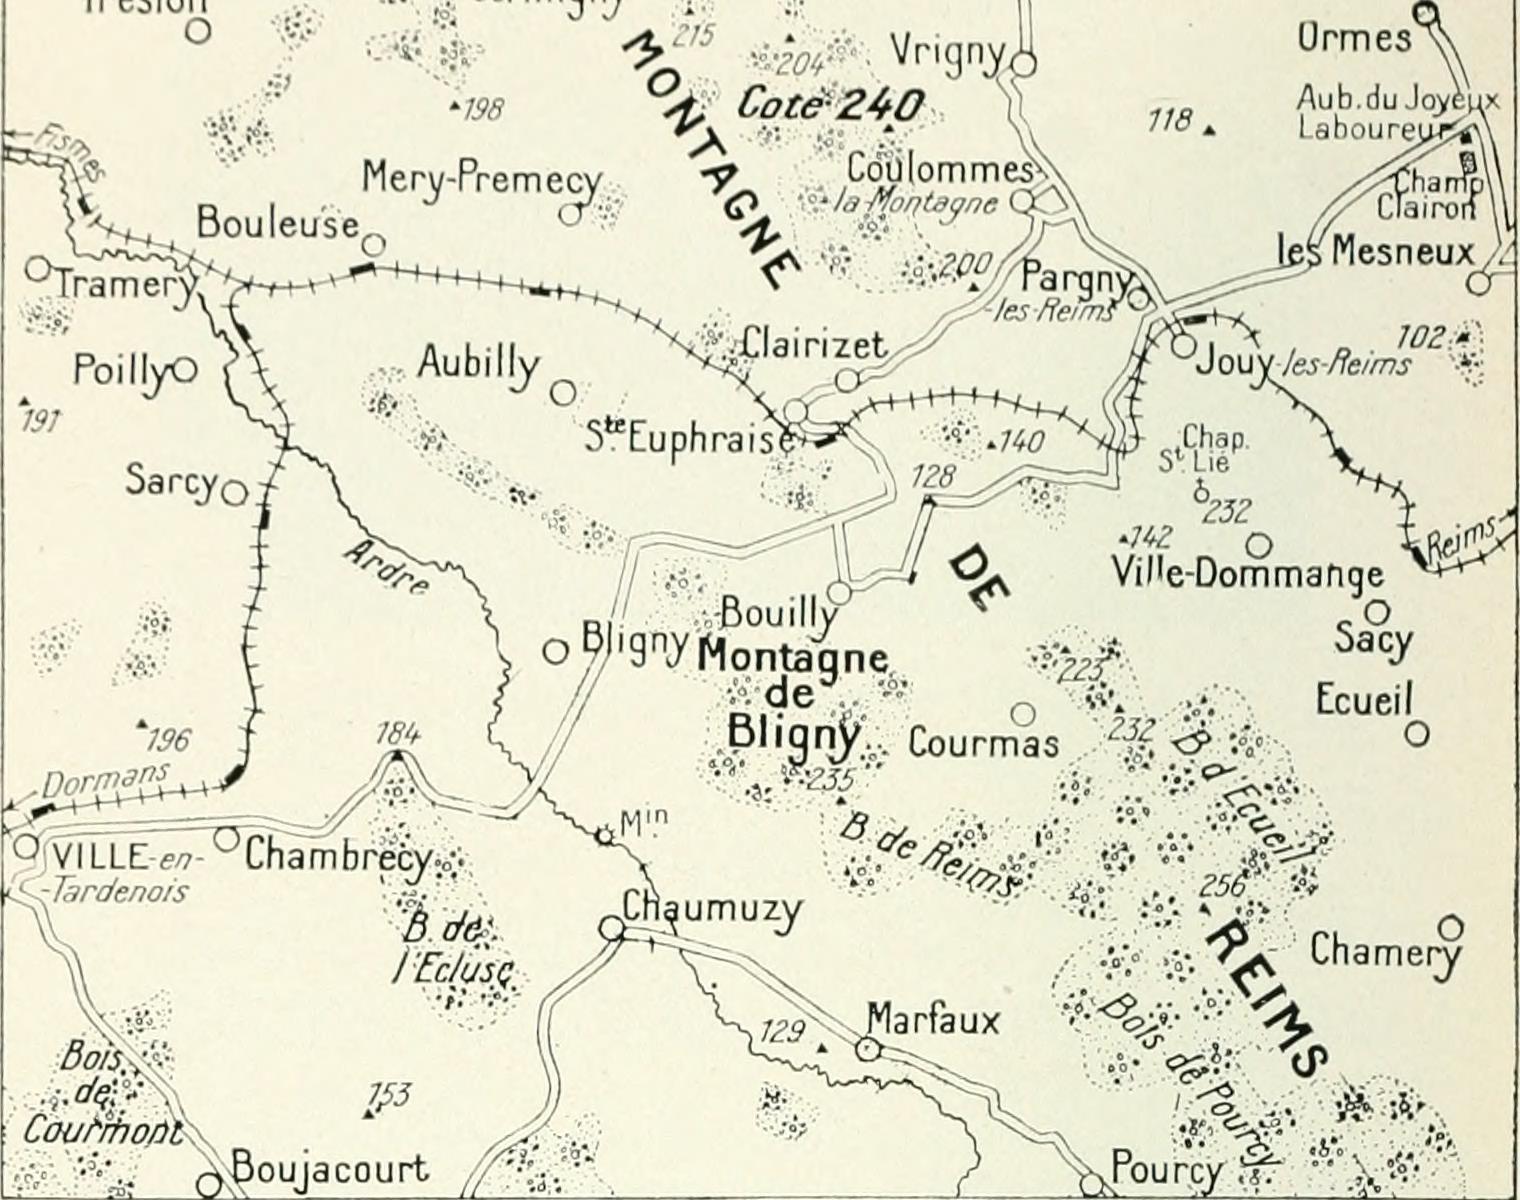 Bligny Hill Marne